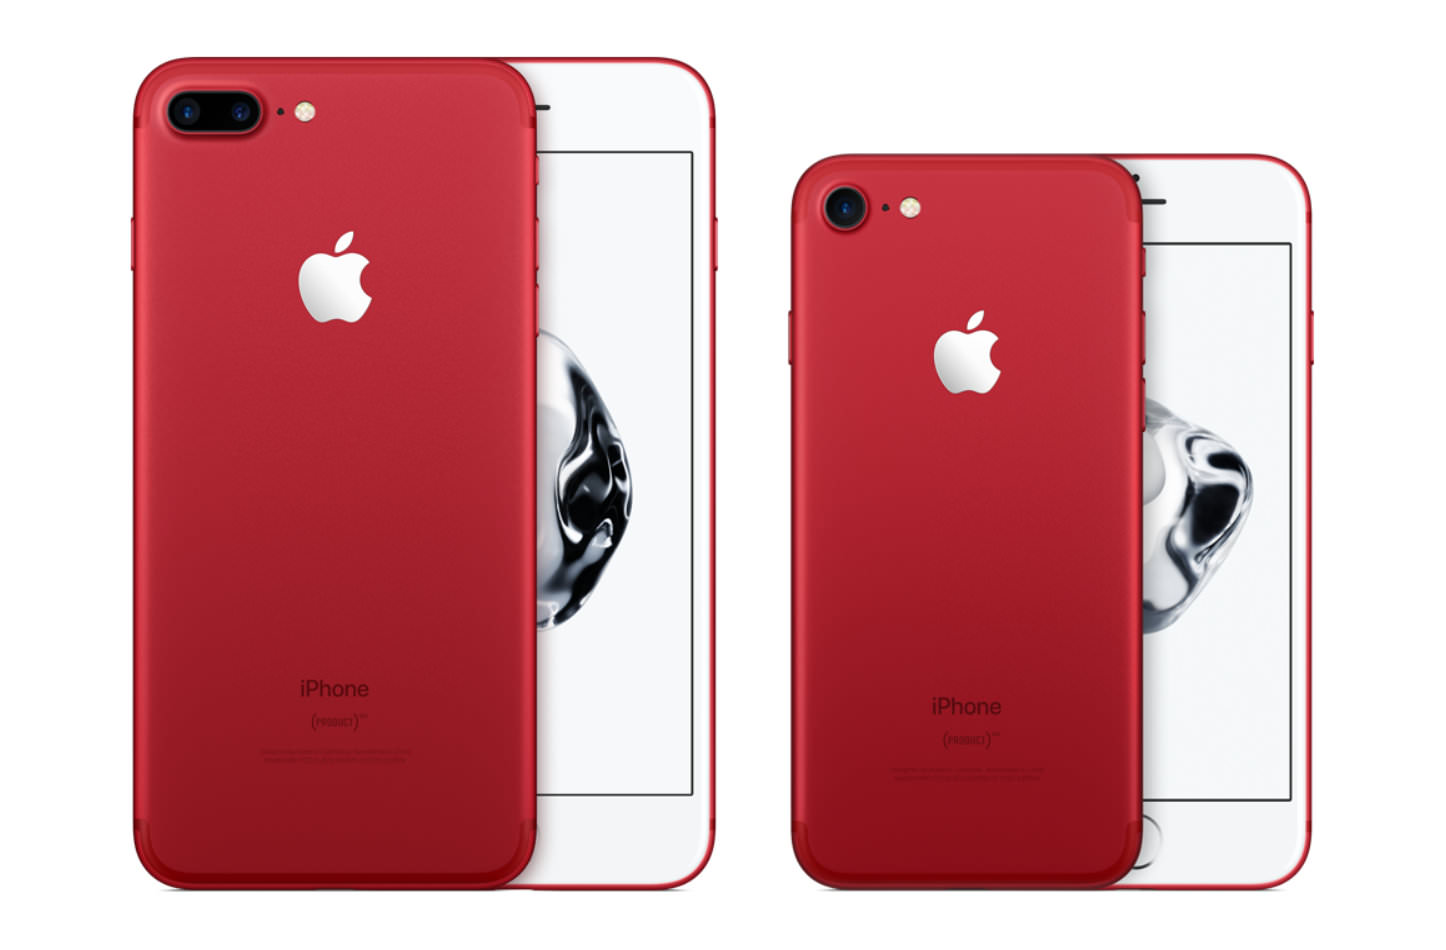 iphone-red-model-in-proper-colors.jpg